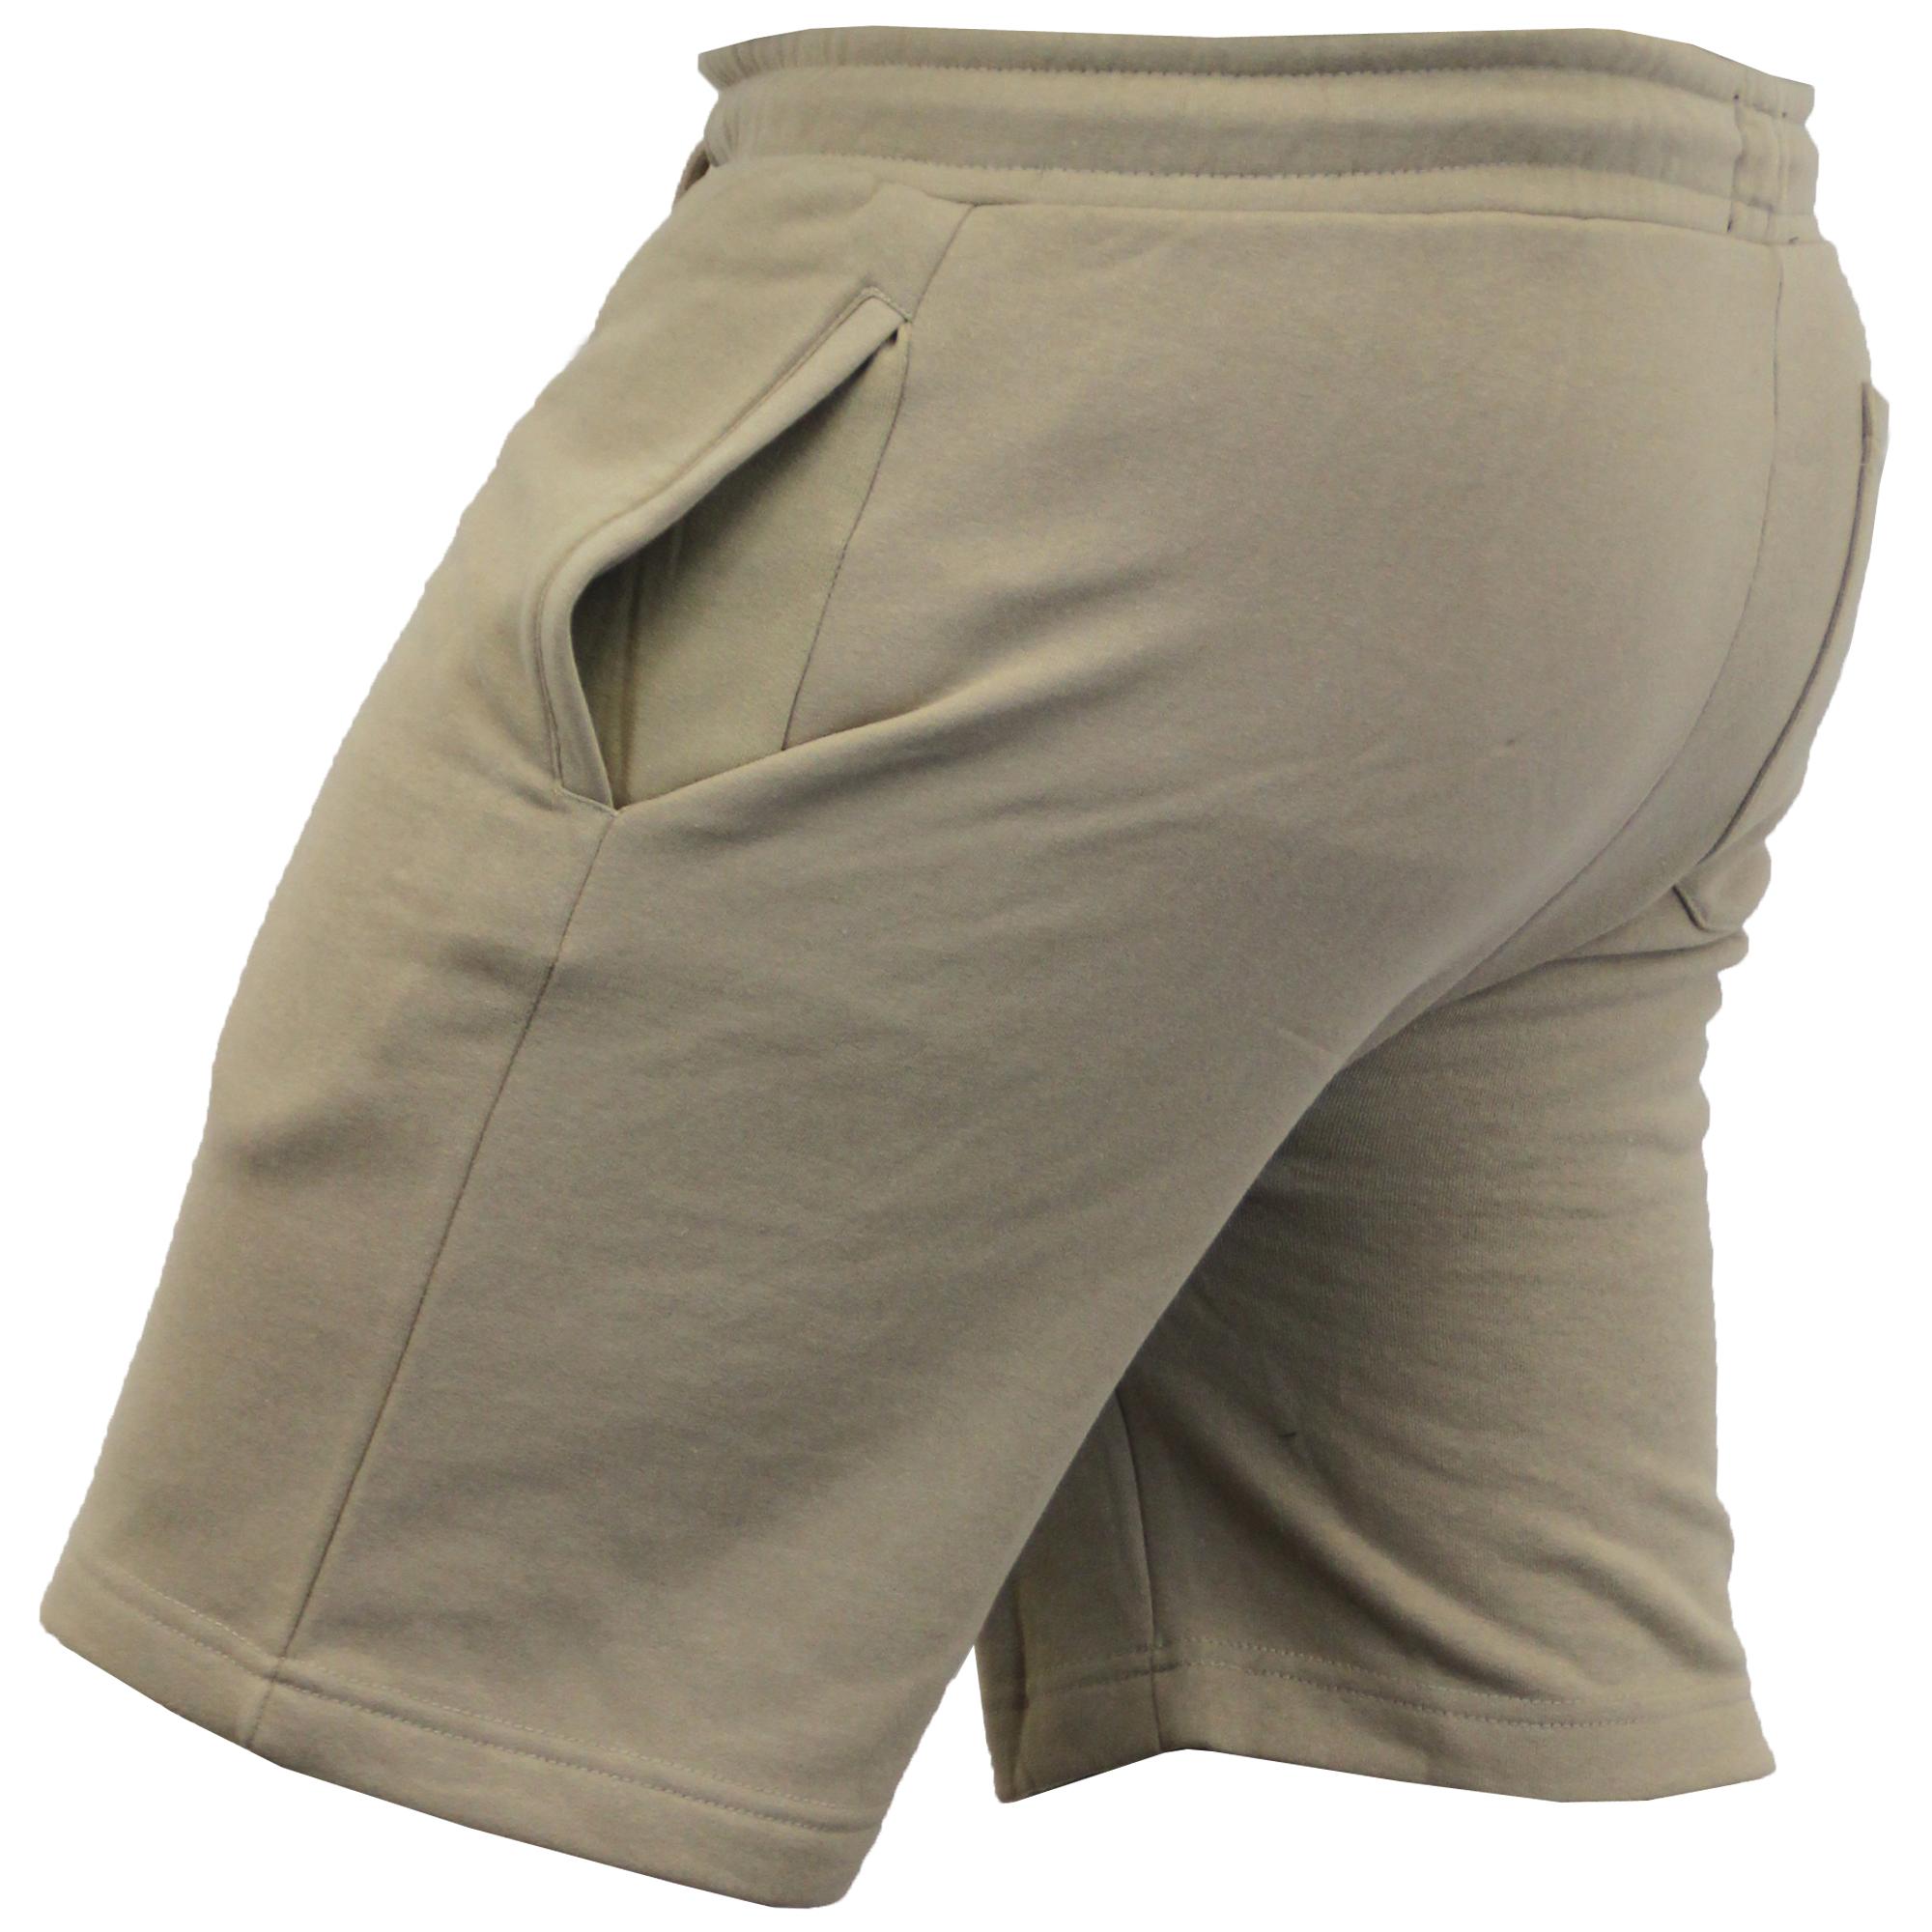 Mens-Jogger-Shorts-Tarley-by-Brave-Soul-Knee-Length-Casual-Fleece-Lined-Summer thumbnail 19